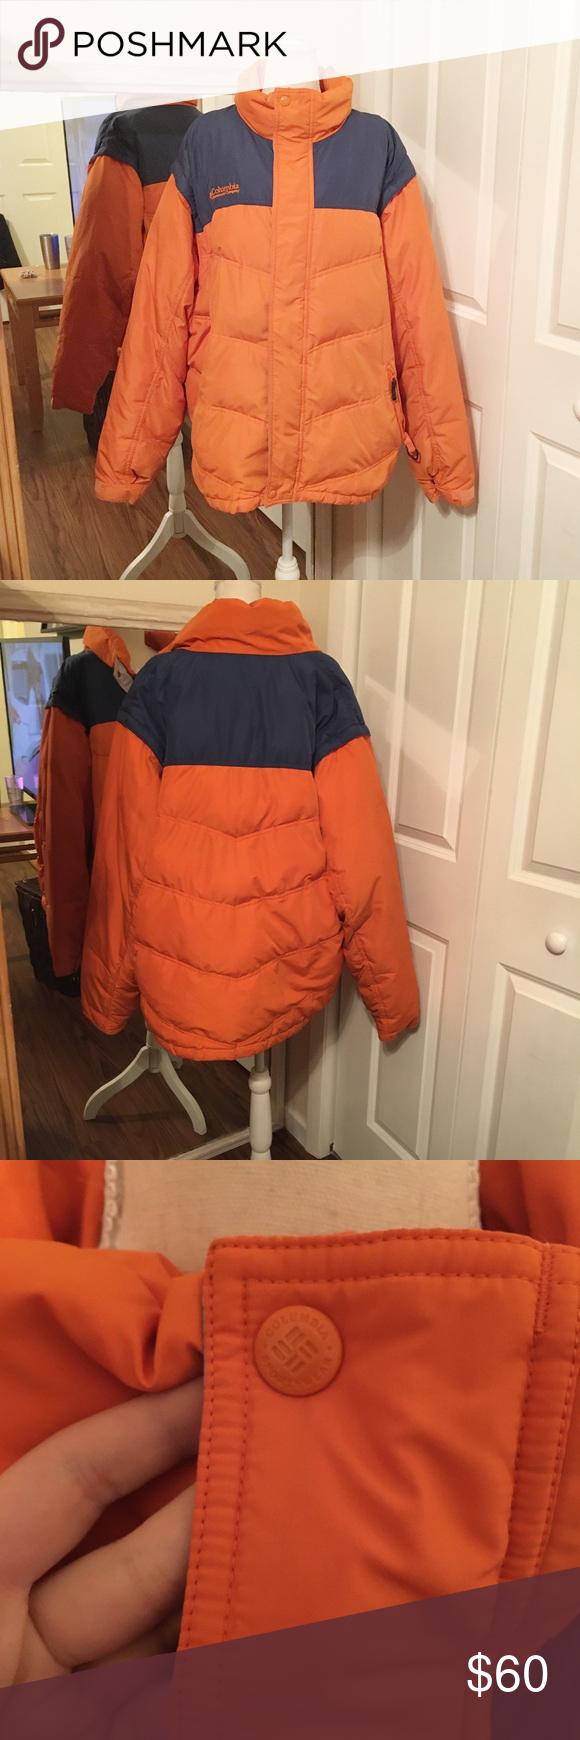 Columbia Orange And Blue Puffer Jacket Men S Men S Size Xl Orange And Blue Button And Zip Closure Puffer Columbia Blue Puffer Jacket Jackets Mens Jackets [ 1740 x 580 Pixel ]